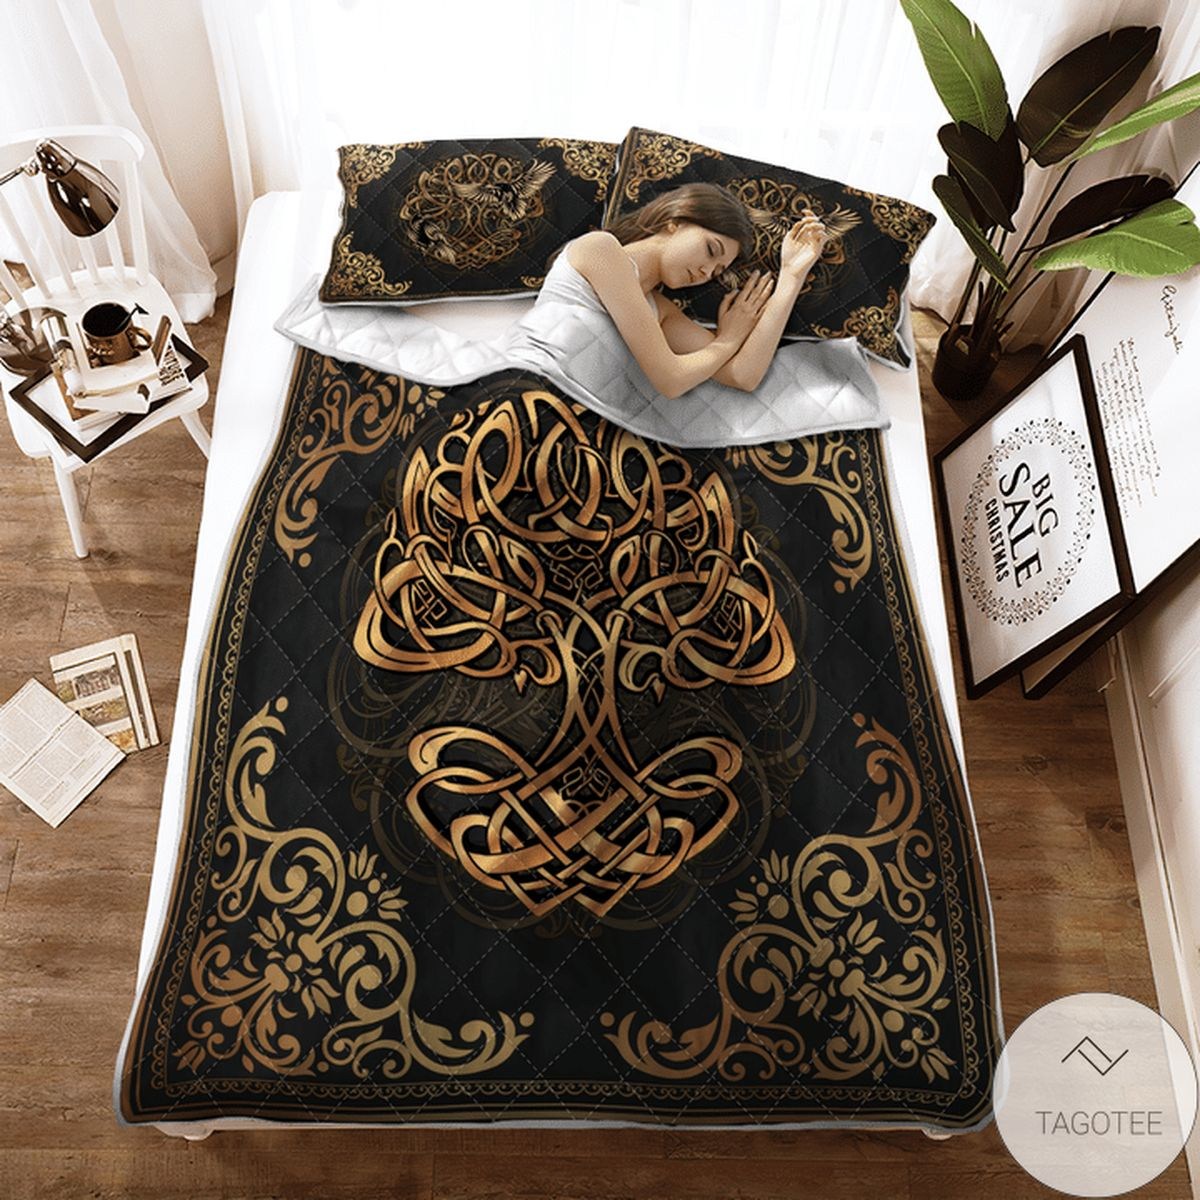 Yggdrasil - Odin's Ravens Huginn And Muninn- Viking Quilt Bedding Set x